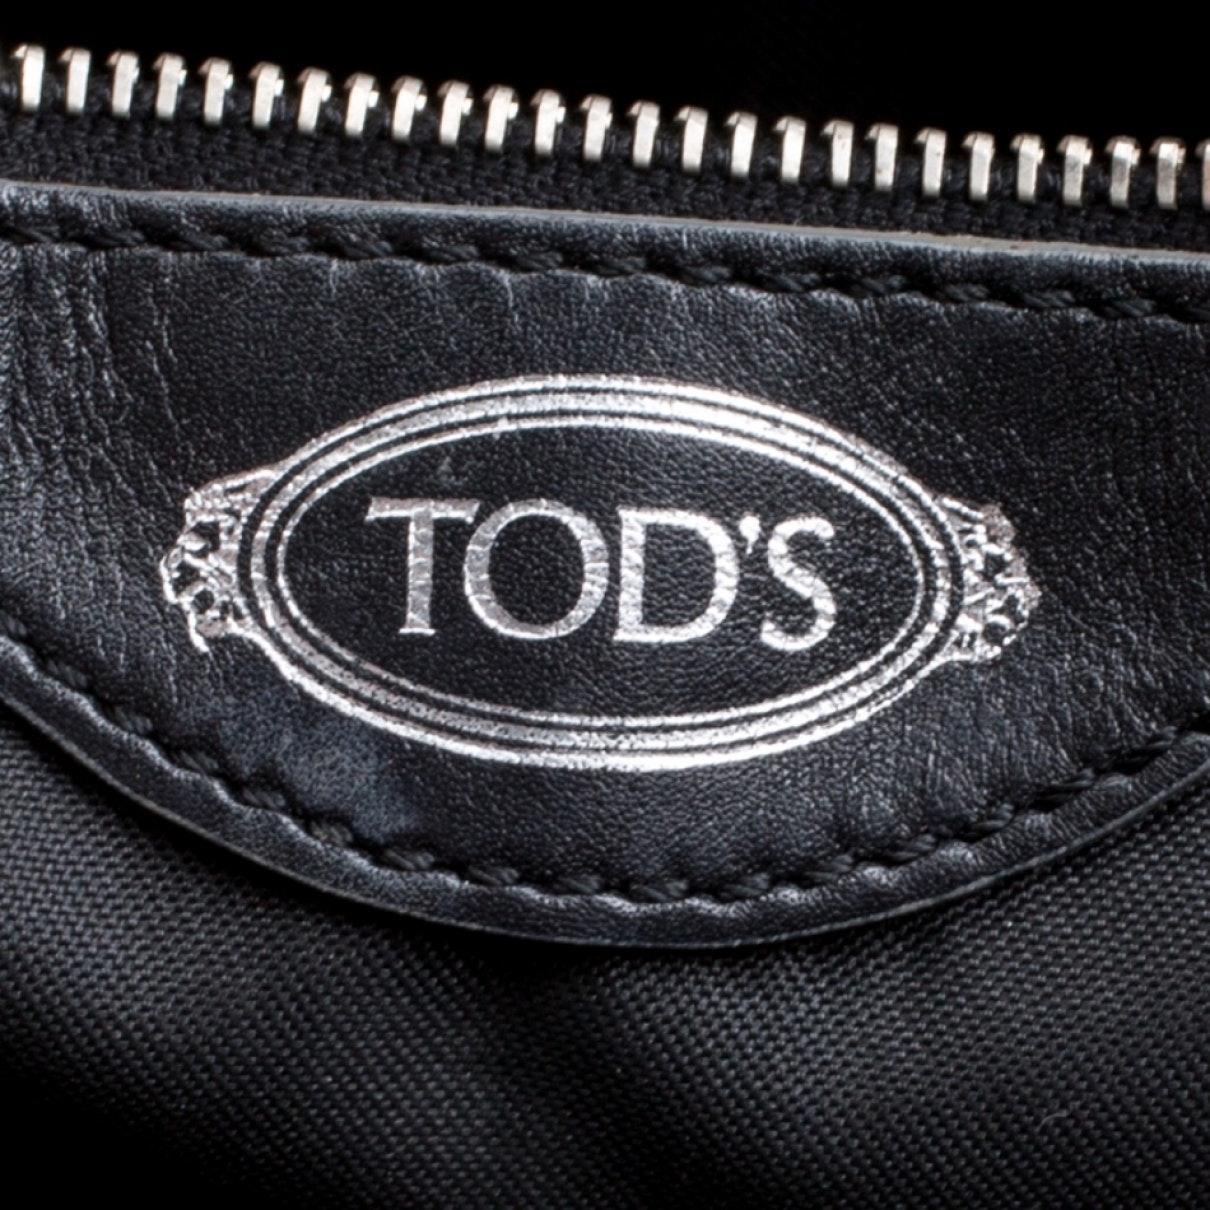 Sac à main en Cuir Noir Tod's en coloris Noir PhLS